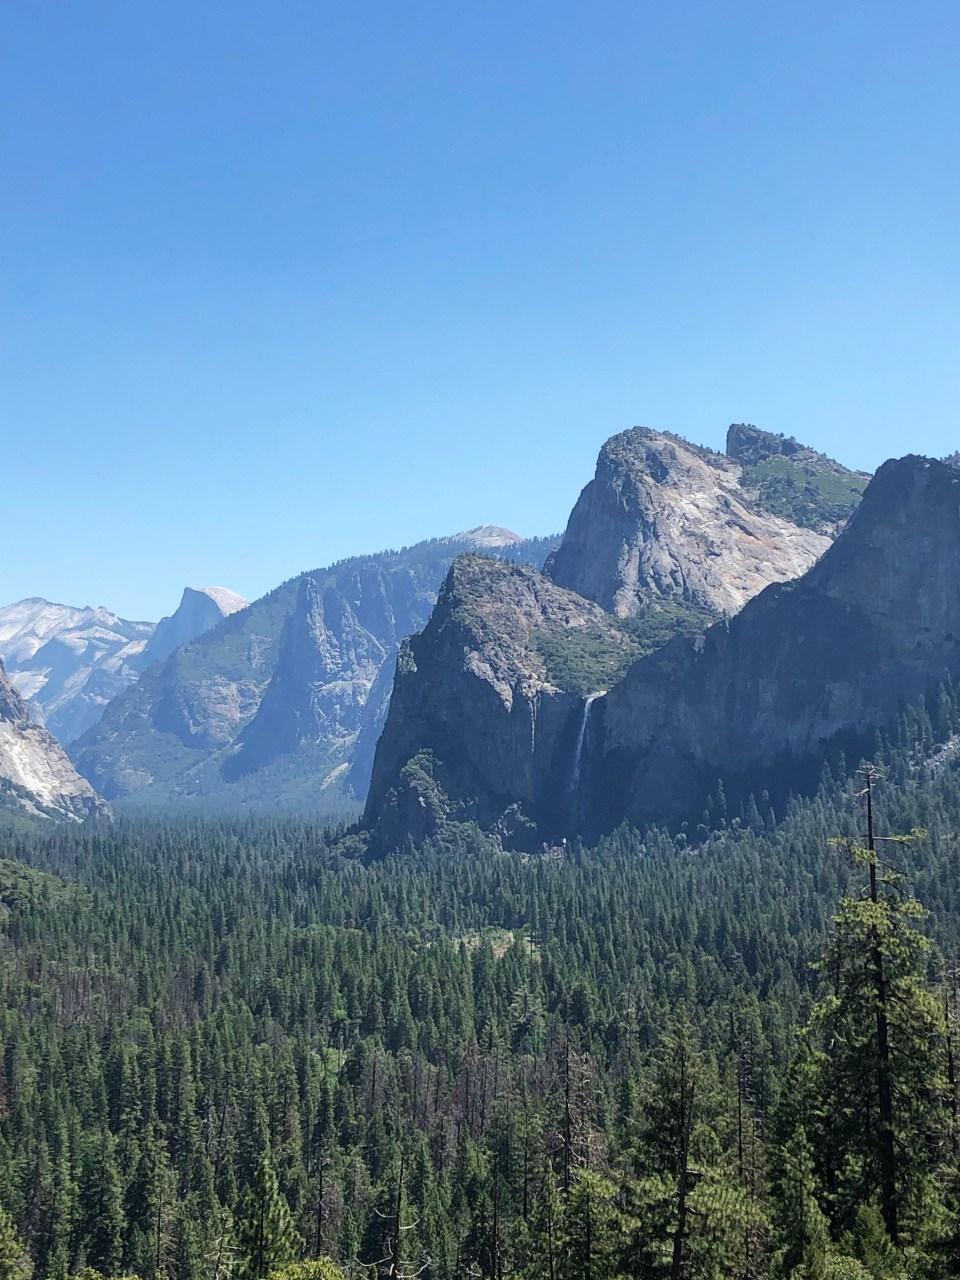 Yosemite National Park - Bridalveil